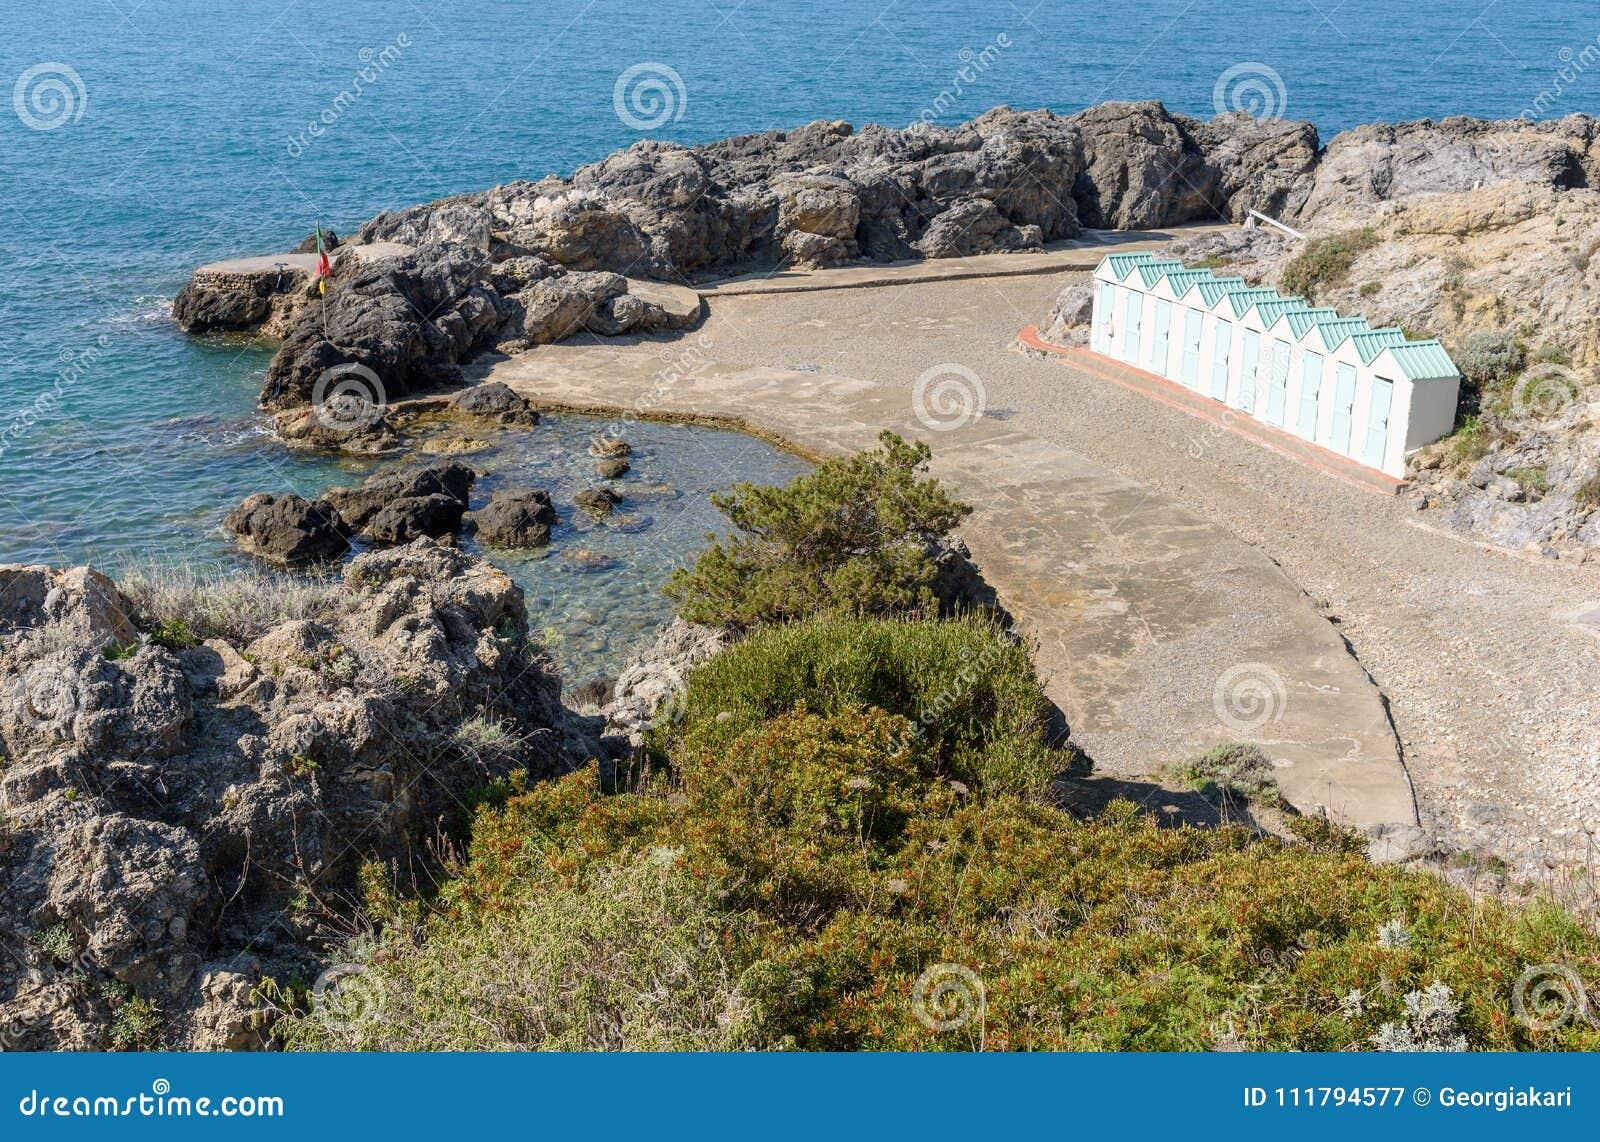 Bagno delle donne beach bei talamone toskana italien stockbild